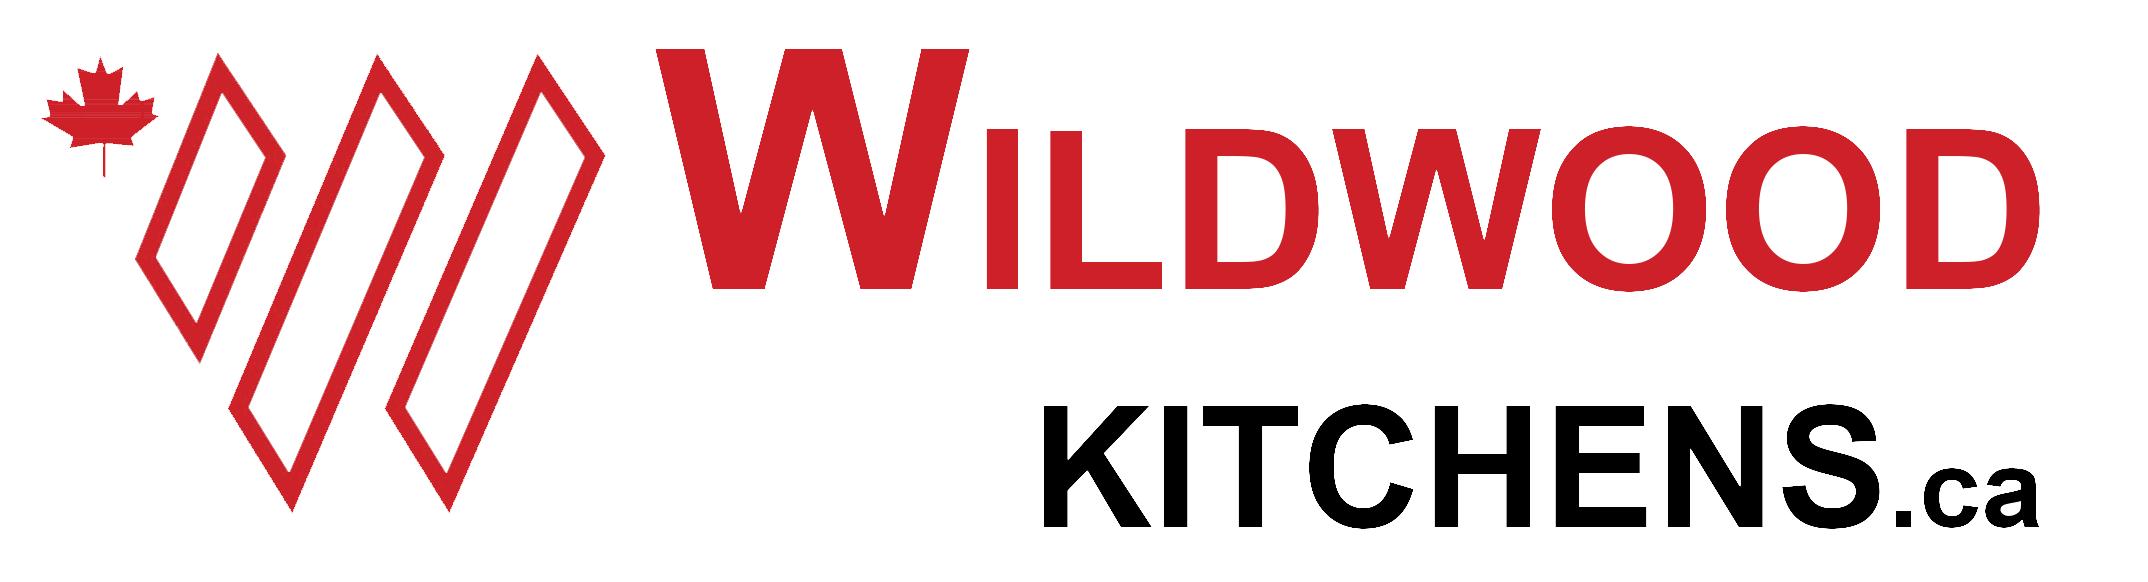 1.1.WILDWOOD-LOGO